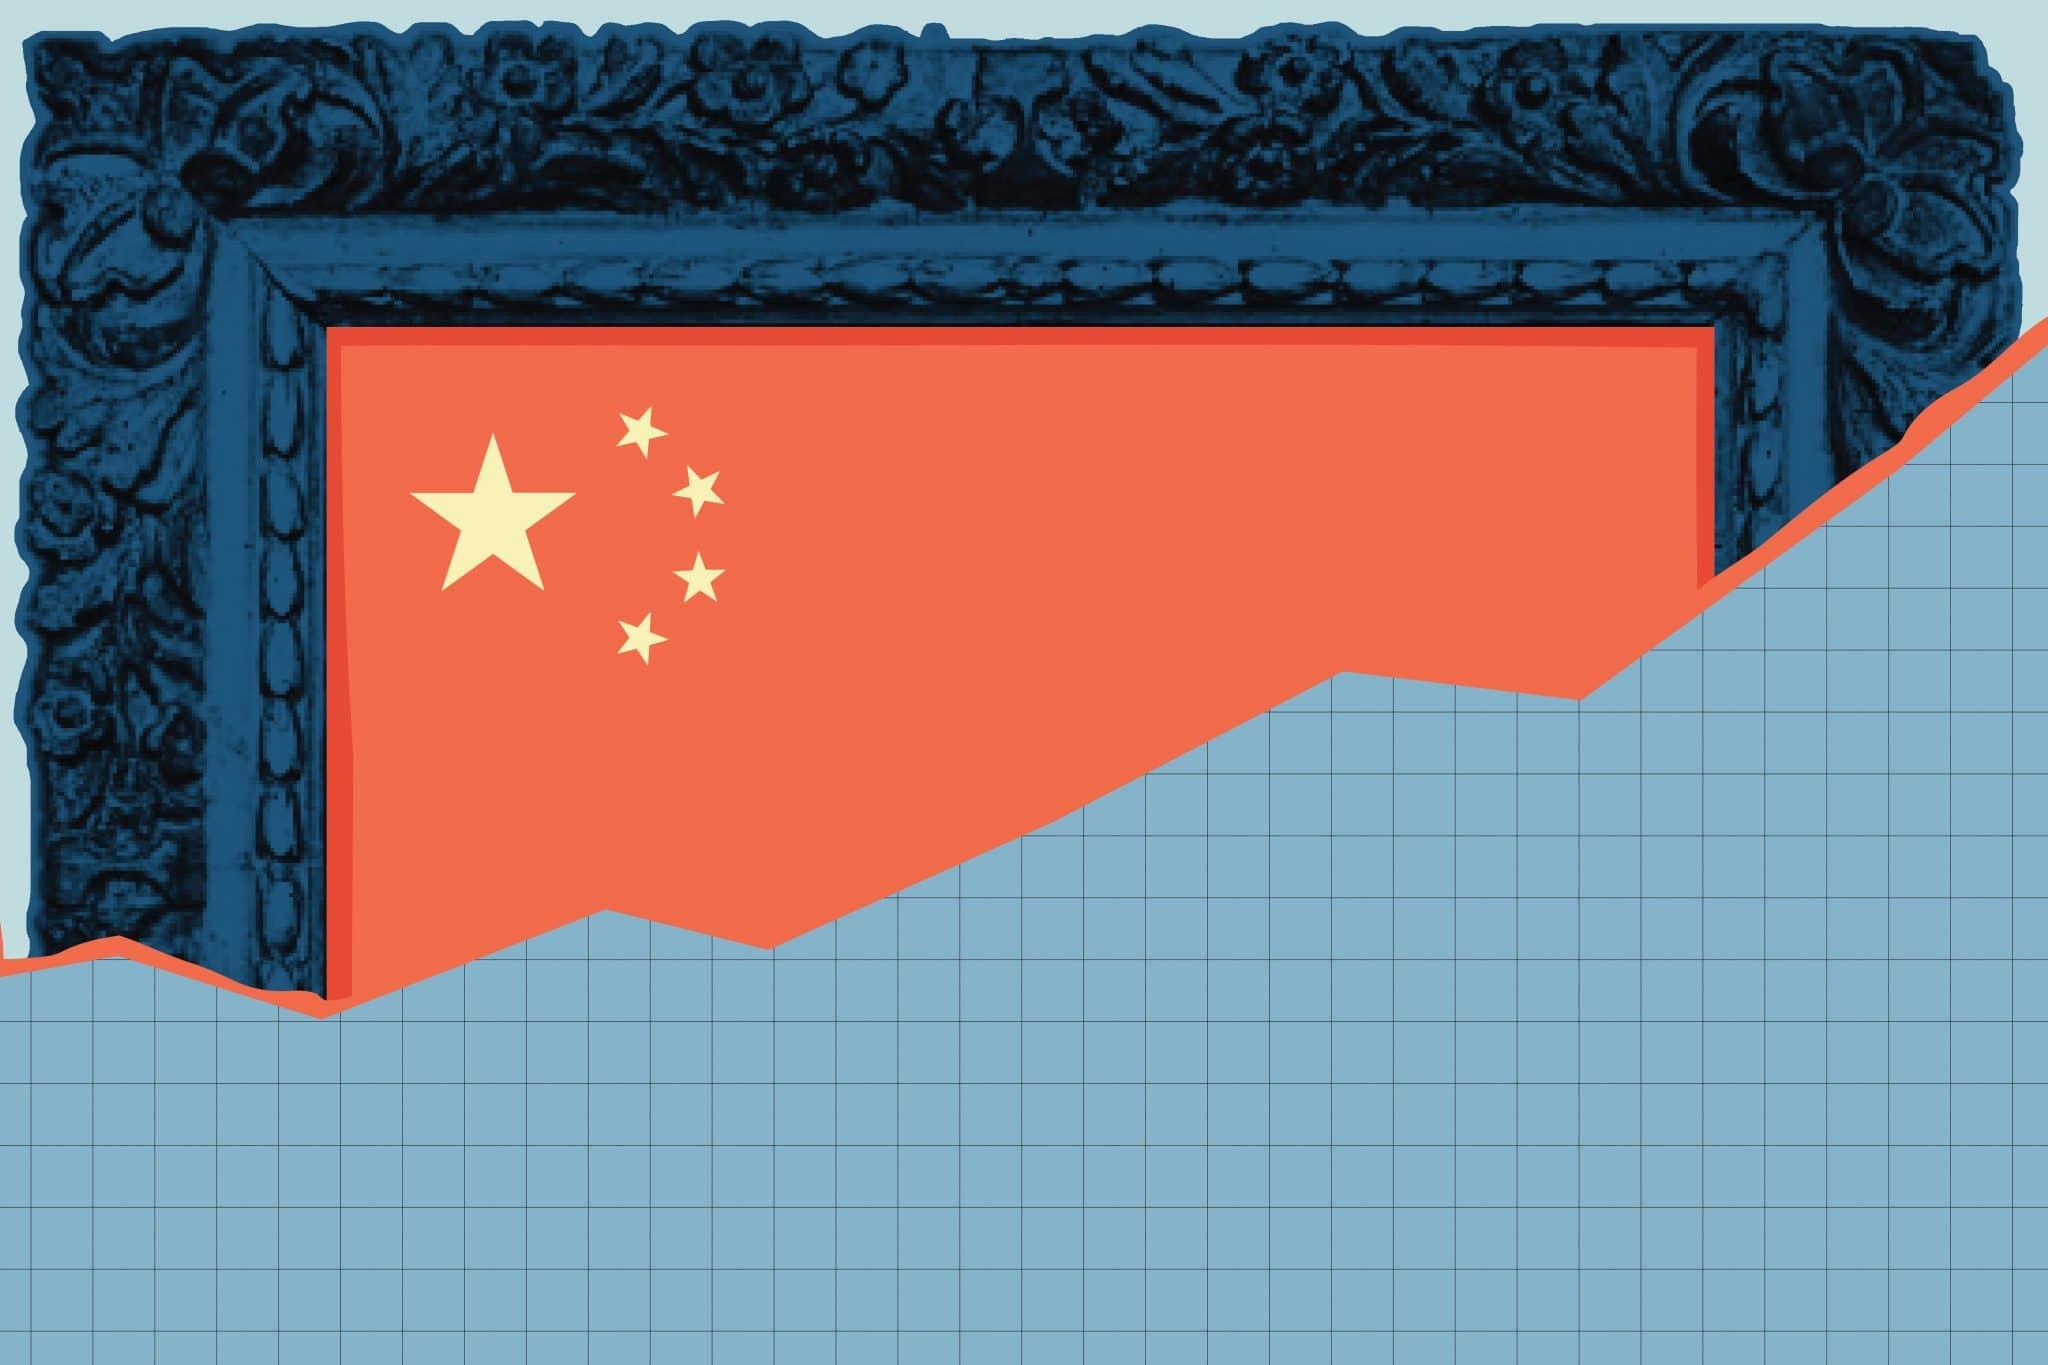 azsia mukincspiac 2020 valtozas scaled